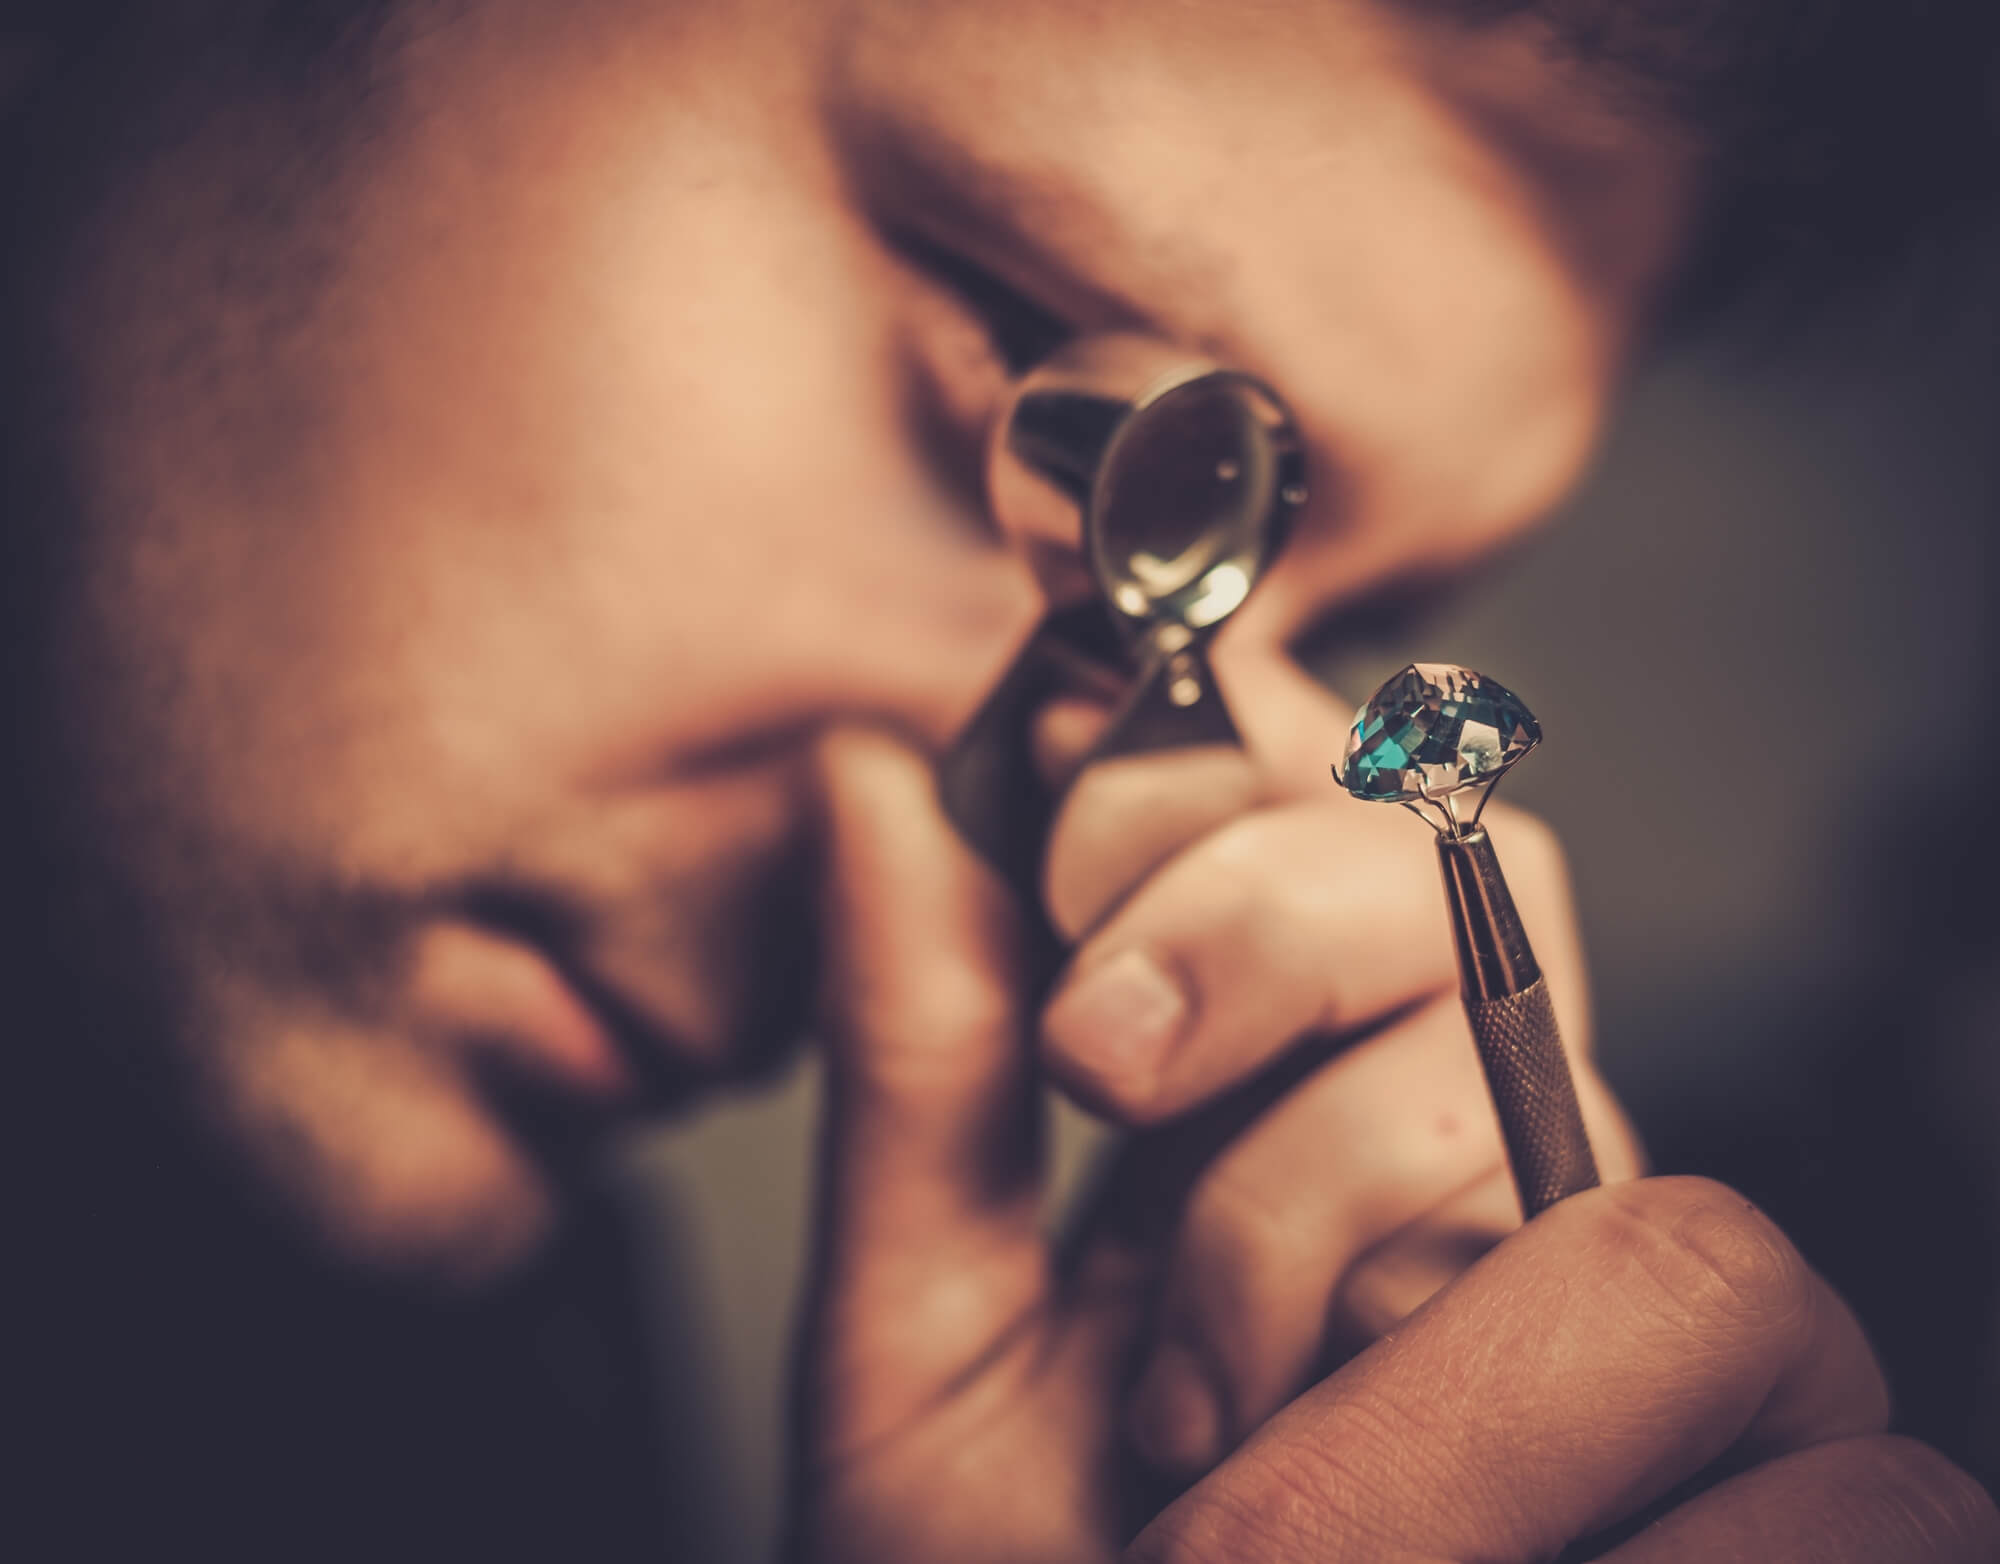 jewelry appraiser examining jewel